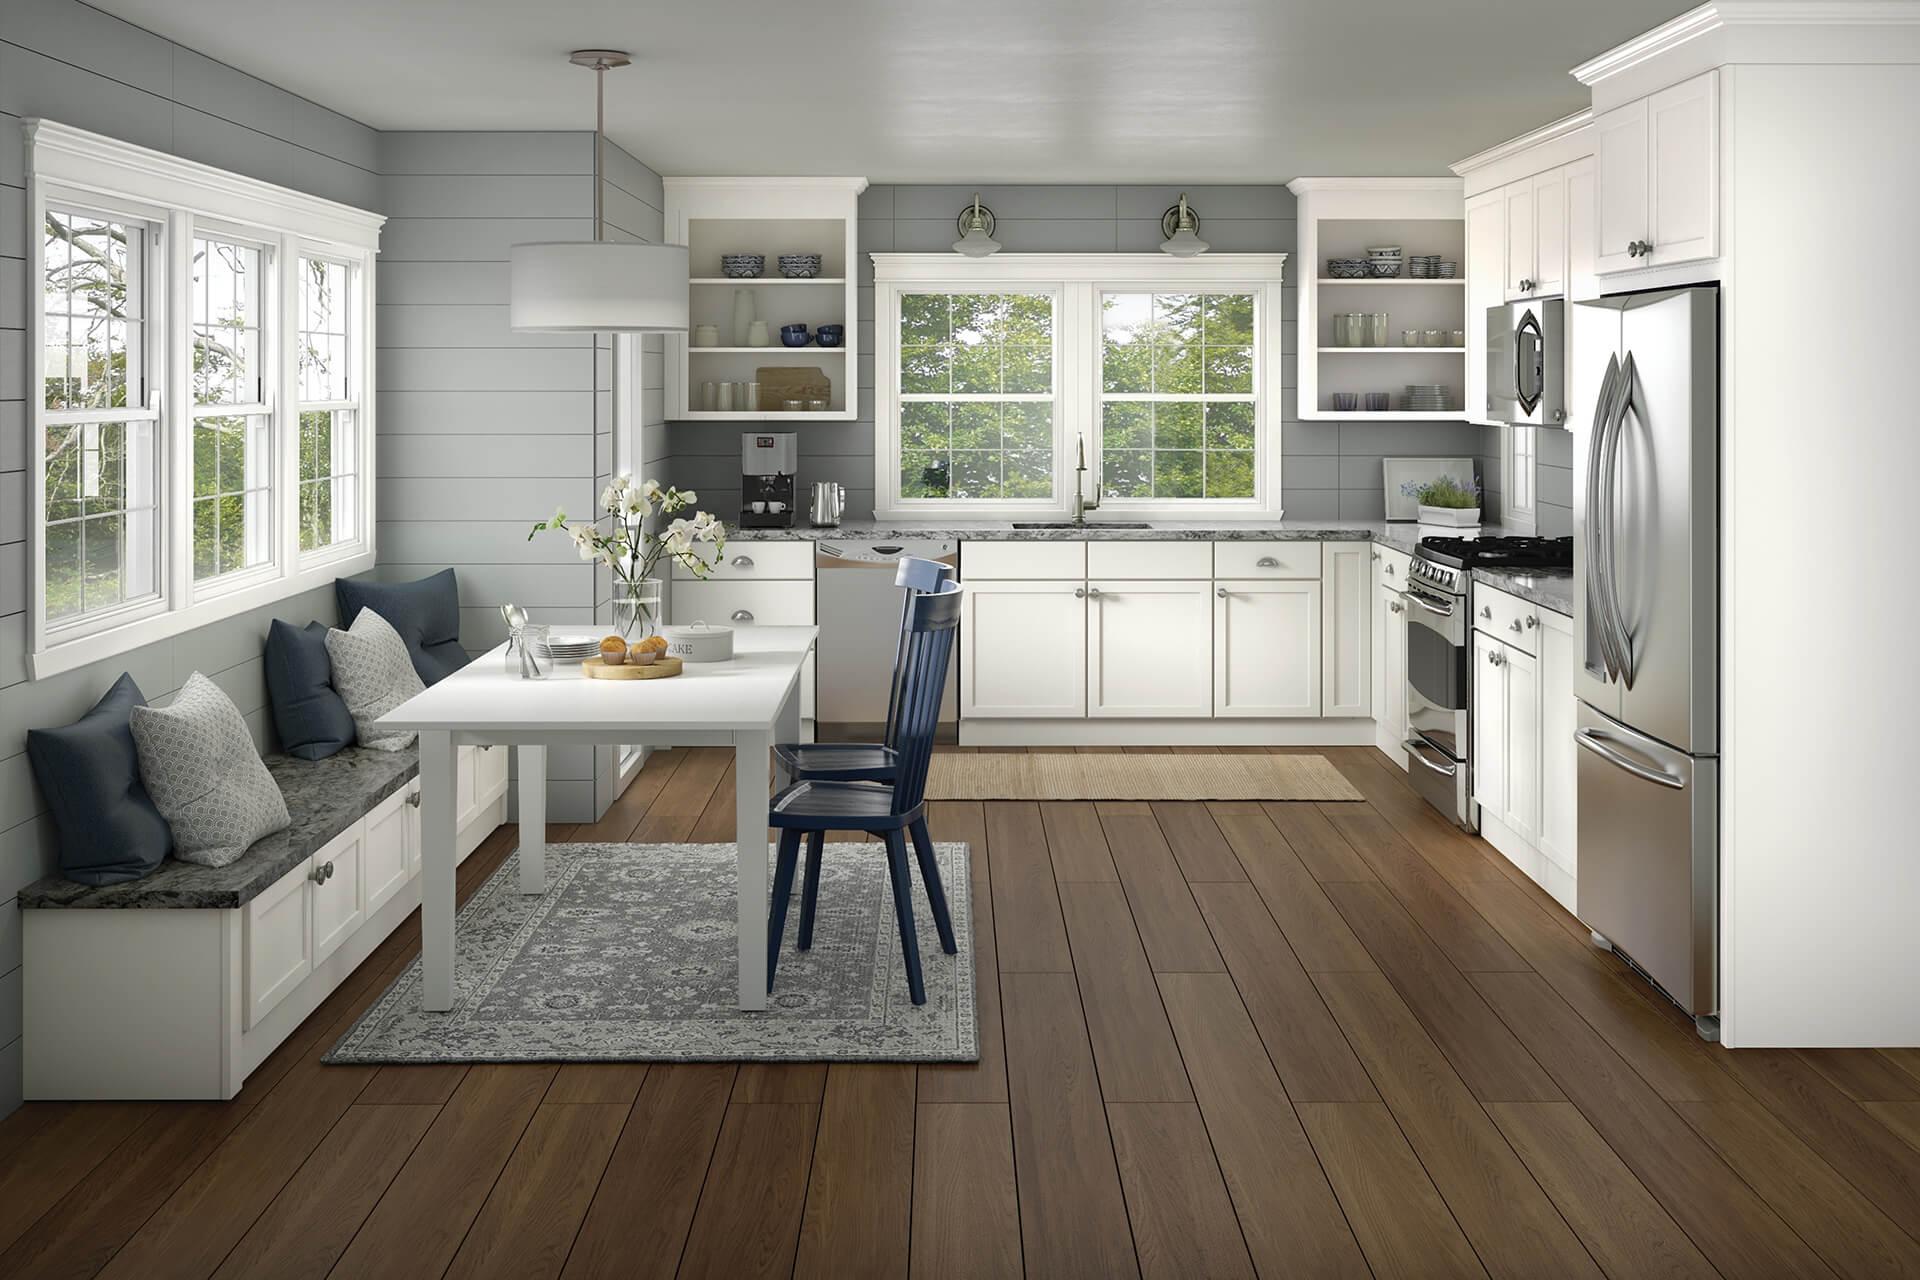 kitchen remodeling virginia beach toy sets fieldstone kitchens remodel republic